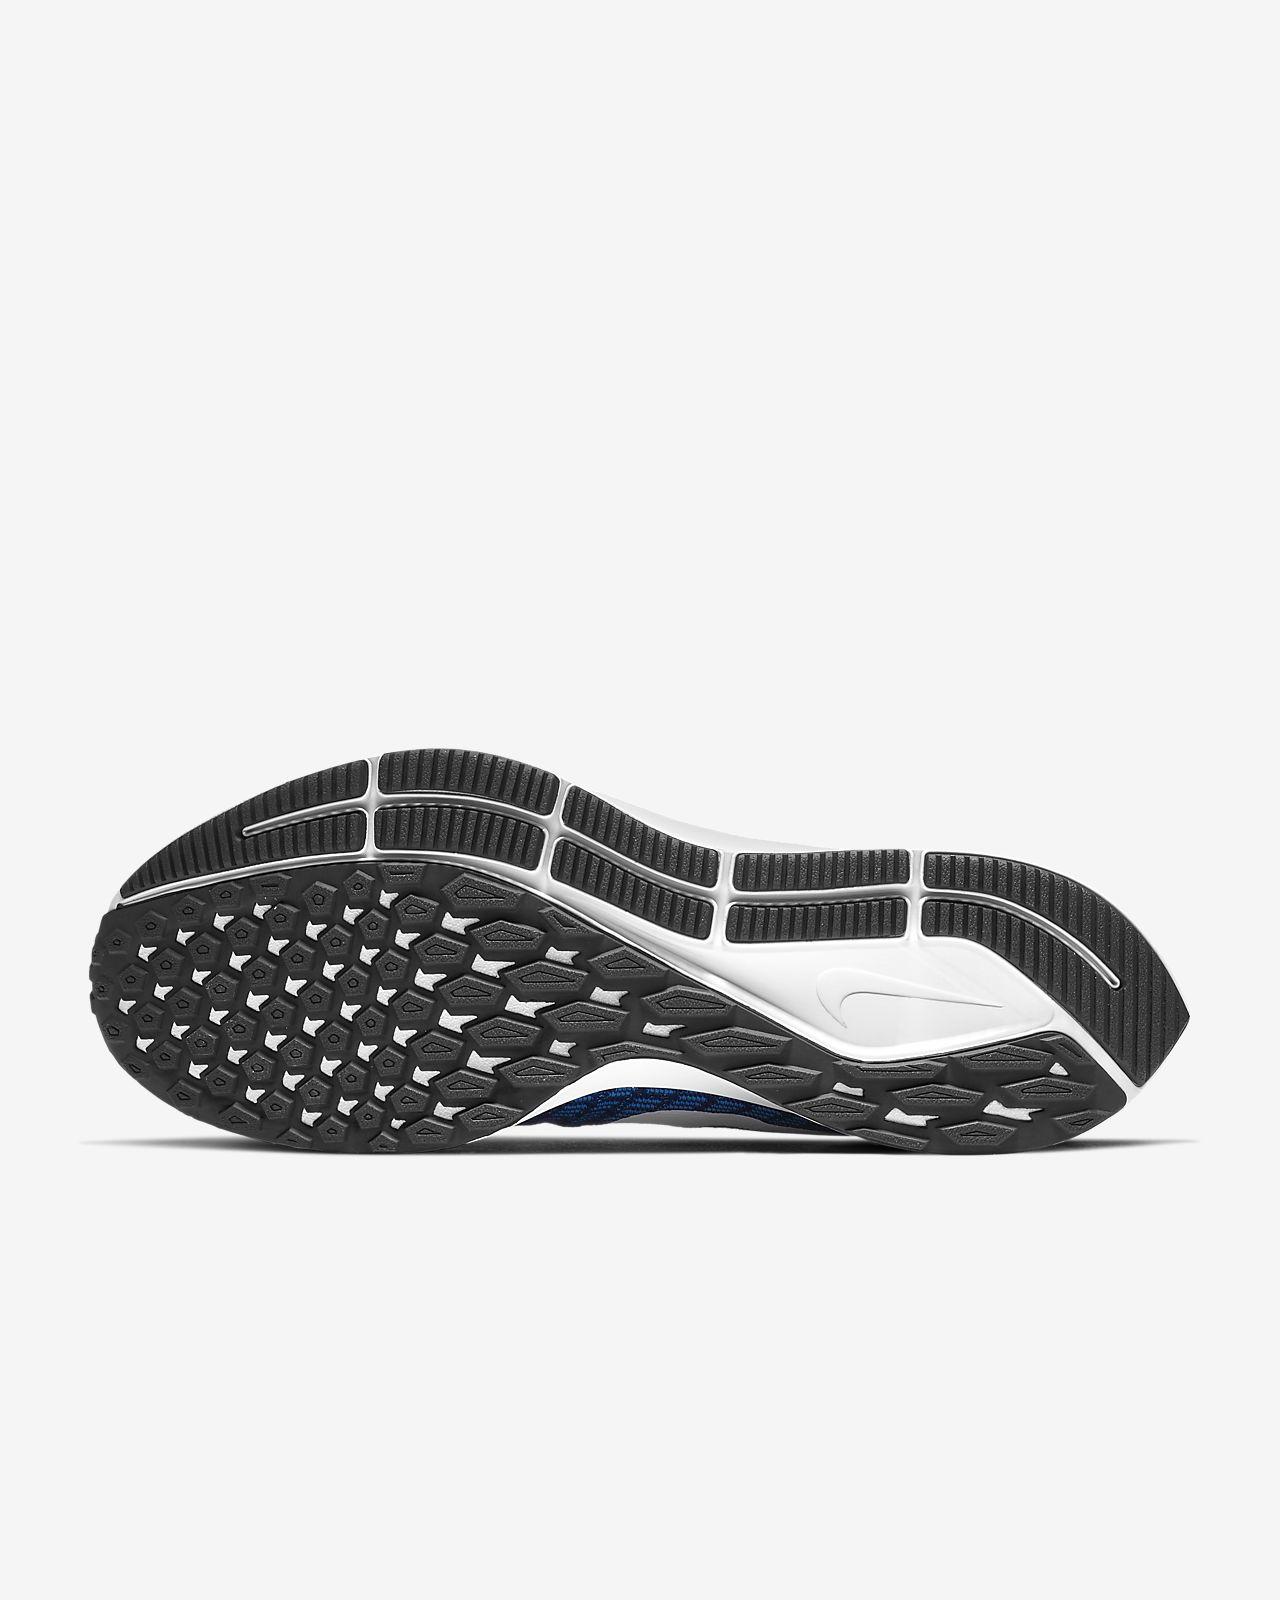 low priced 78146 074a5 ... Nike Air Zoom Pegasus 35 Herren-Laufschuh